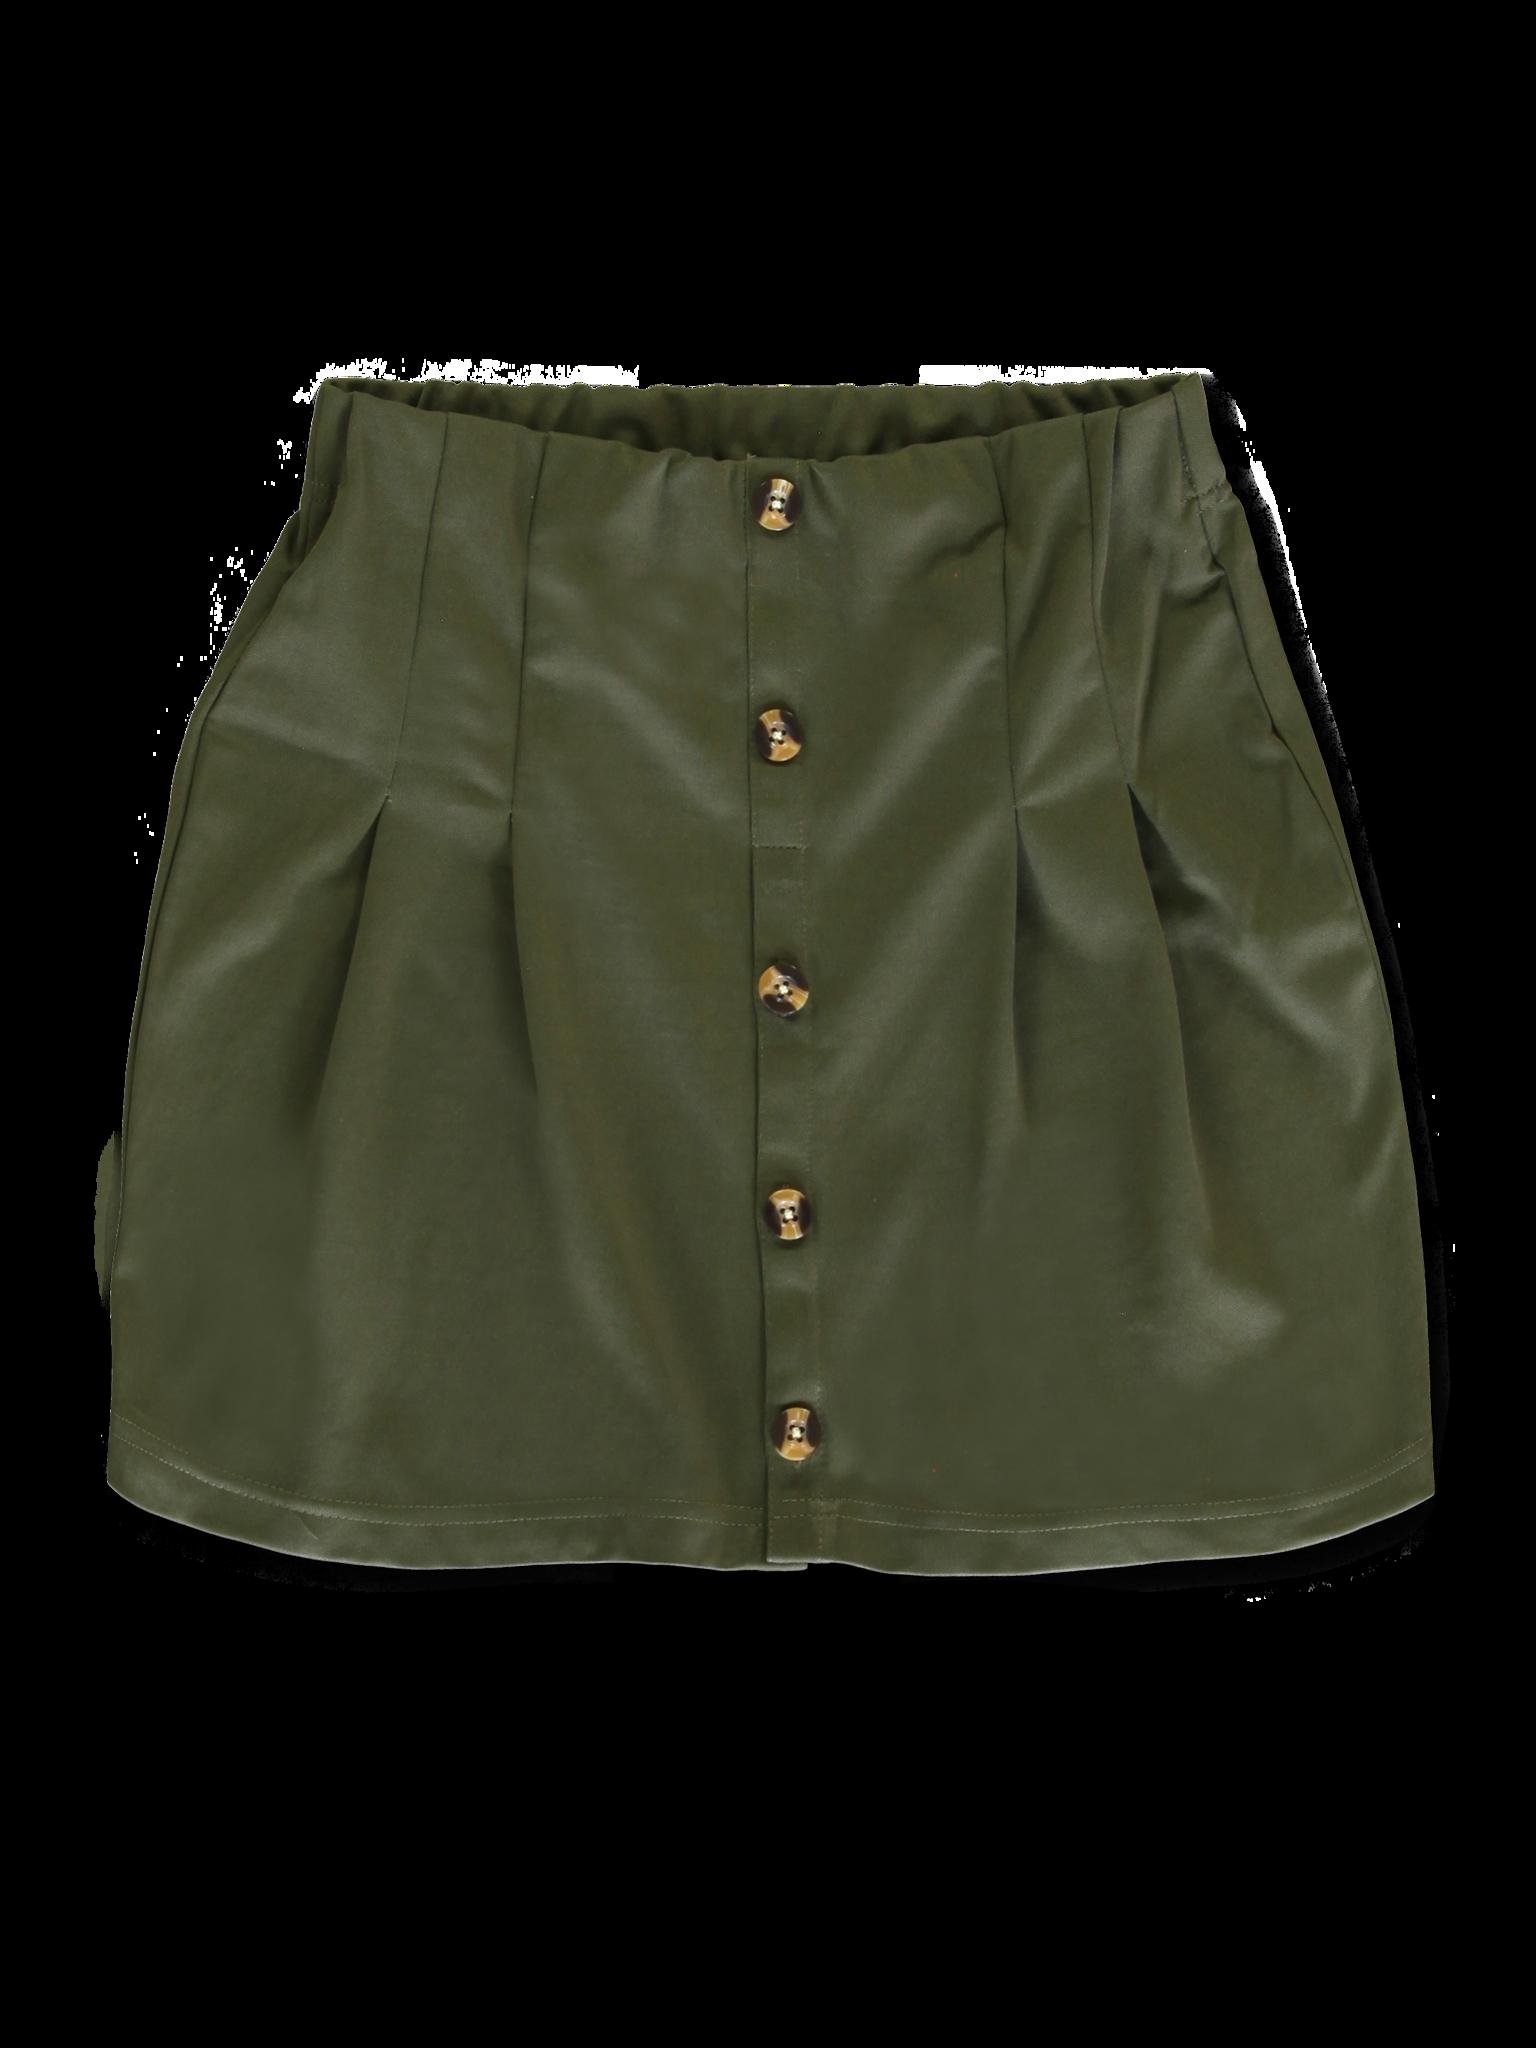 Lemon Beret | Summer 2020 Teen Girls | Skirt | 12 pcs/box